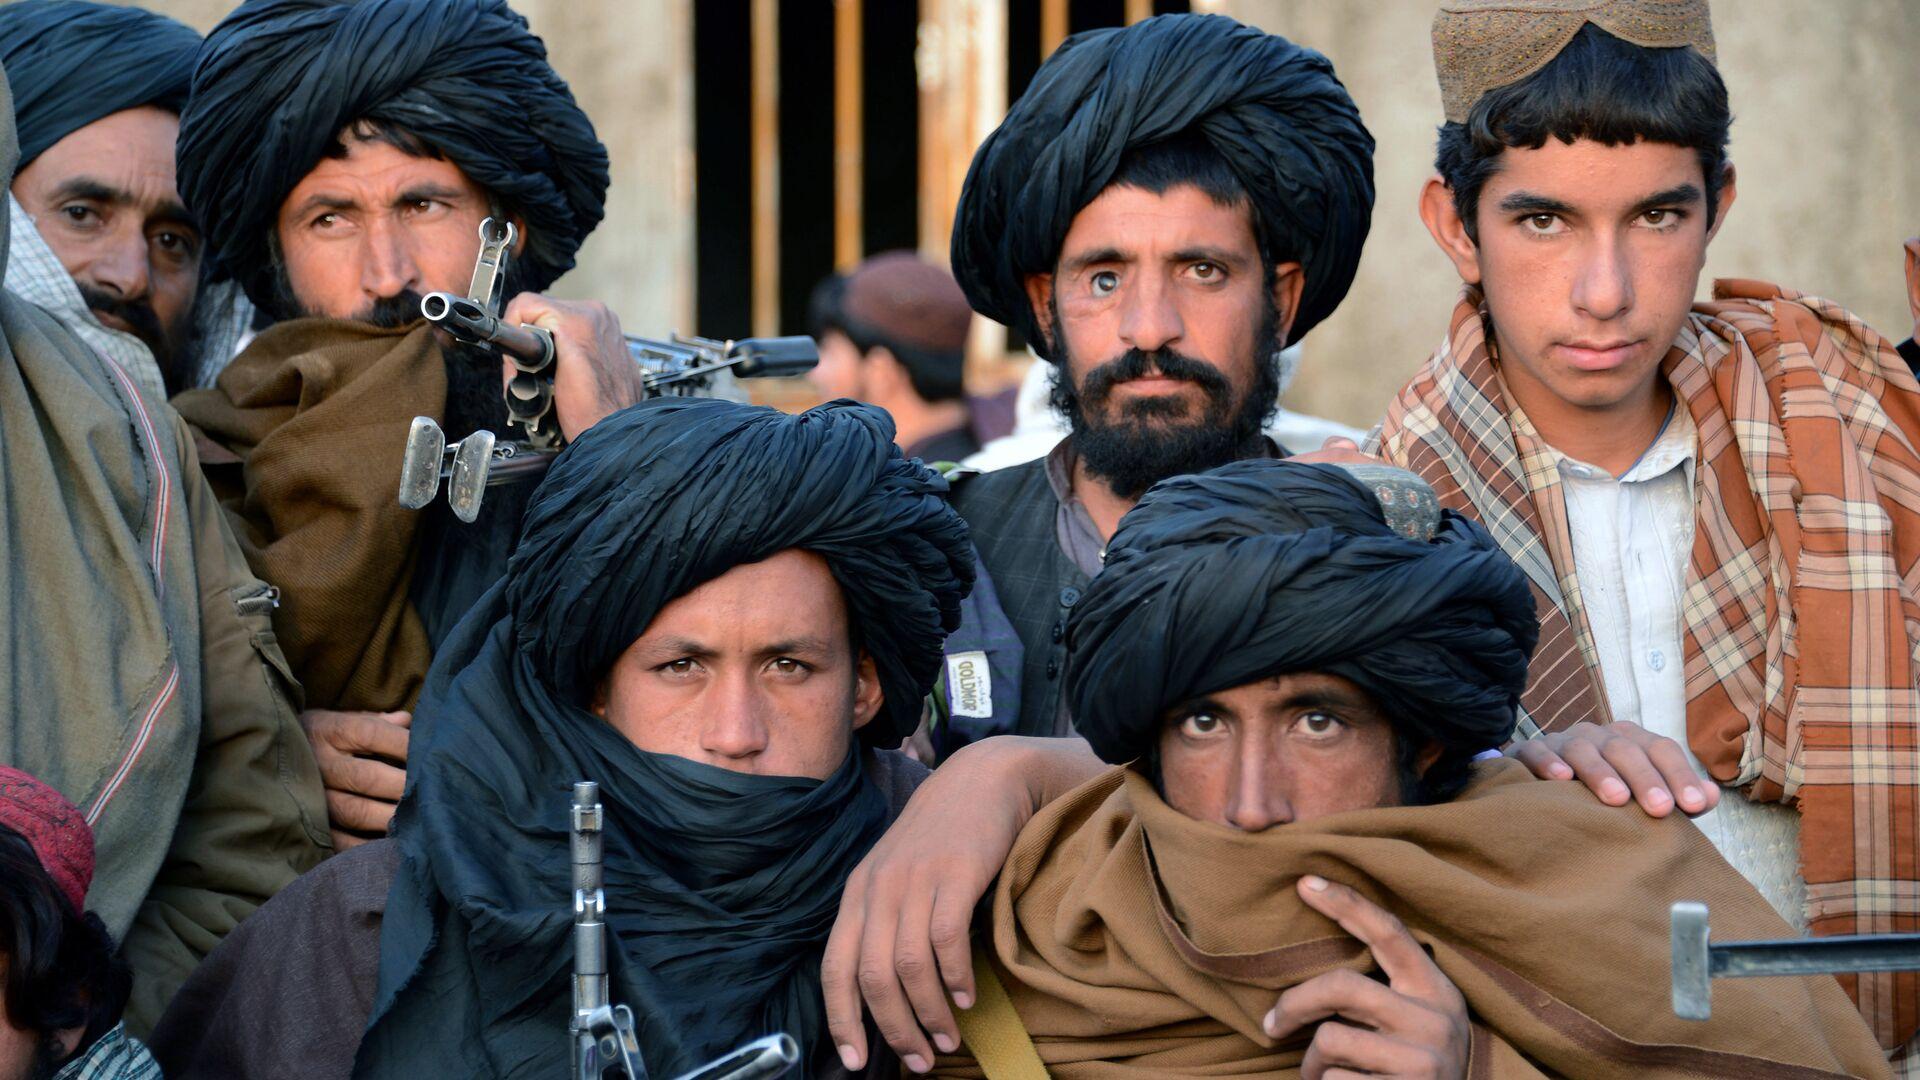 Combatientes de Talibán en Afganistán - Sputnik Mundo, 1920, 10.10.2021